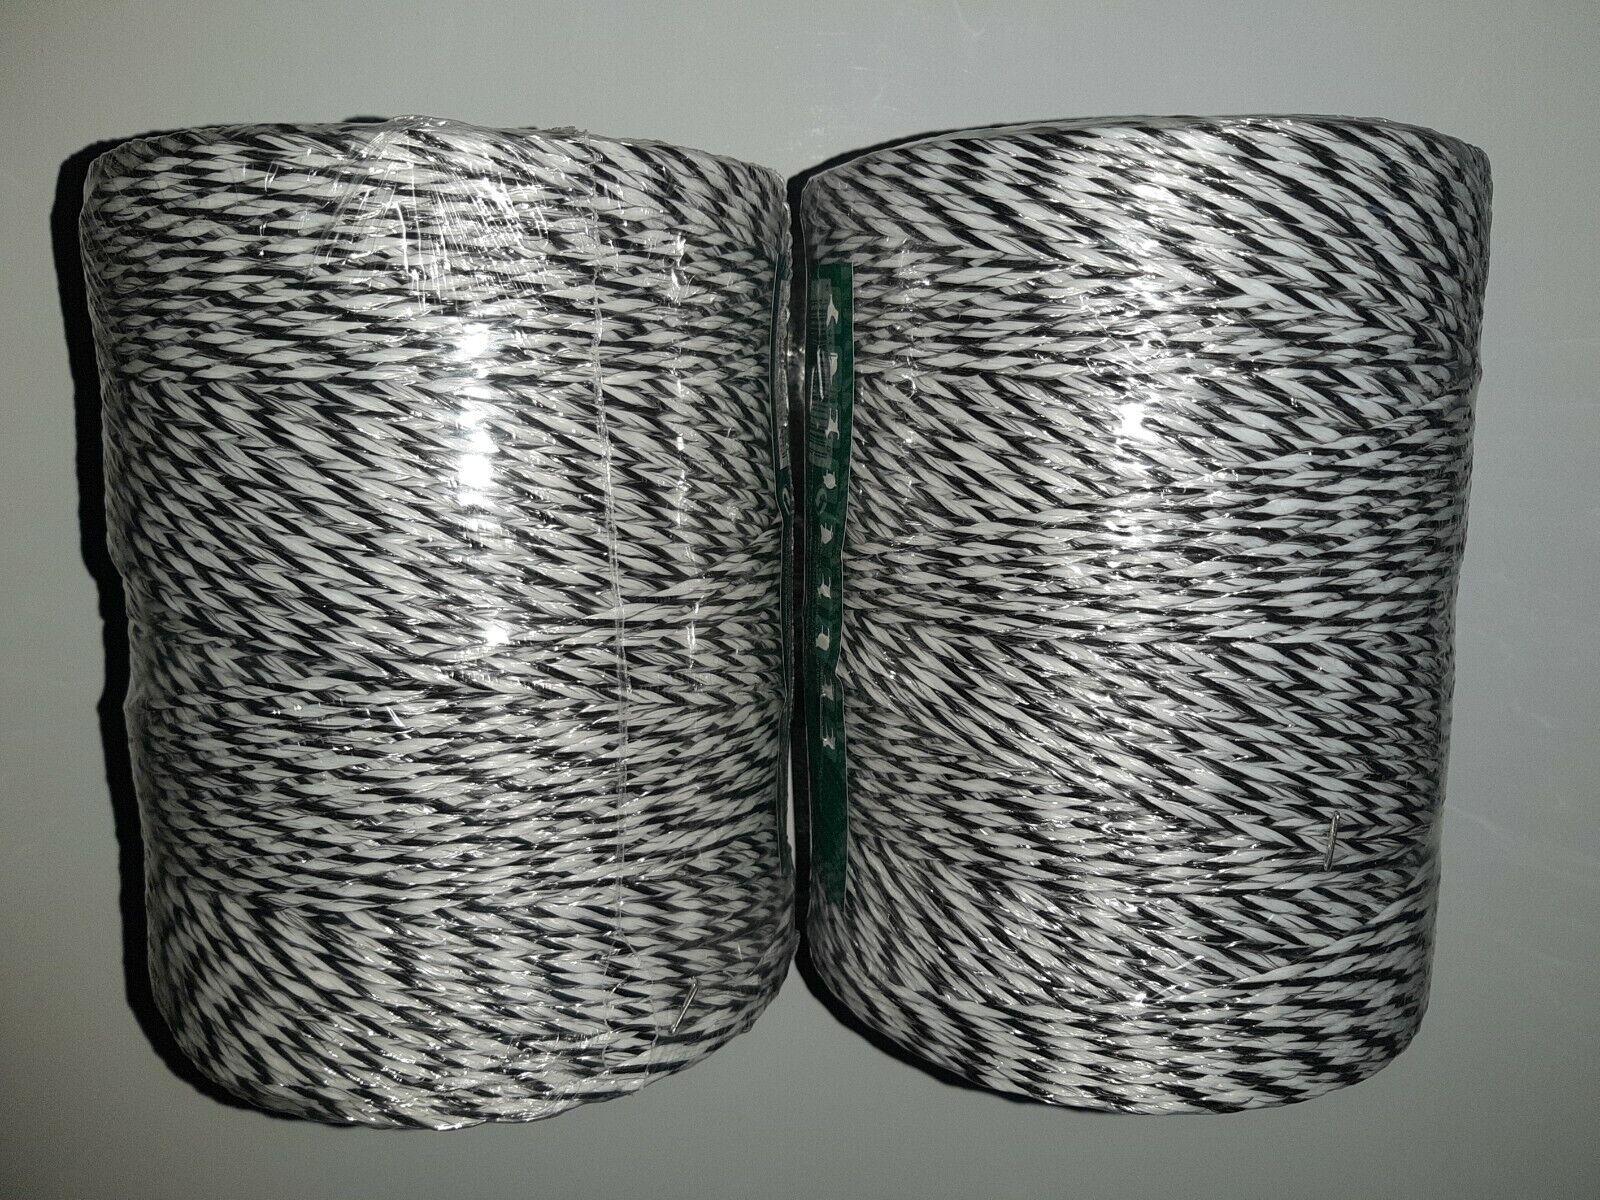 RECINZIONE Elettrica Poly Wire 500m x 3mm 9 Trefolo Filo Recinto Elettrico x 2 rossoOLI AKO